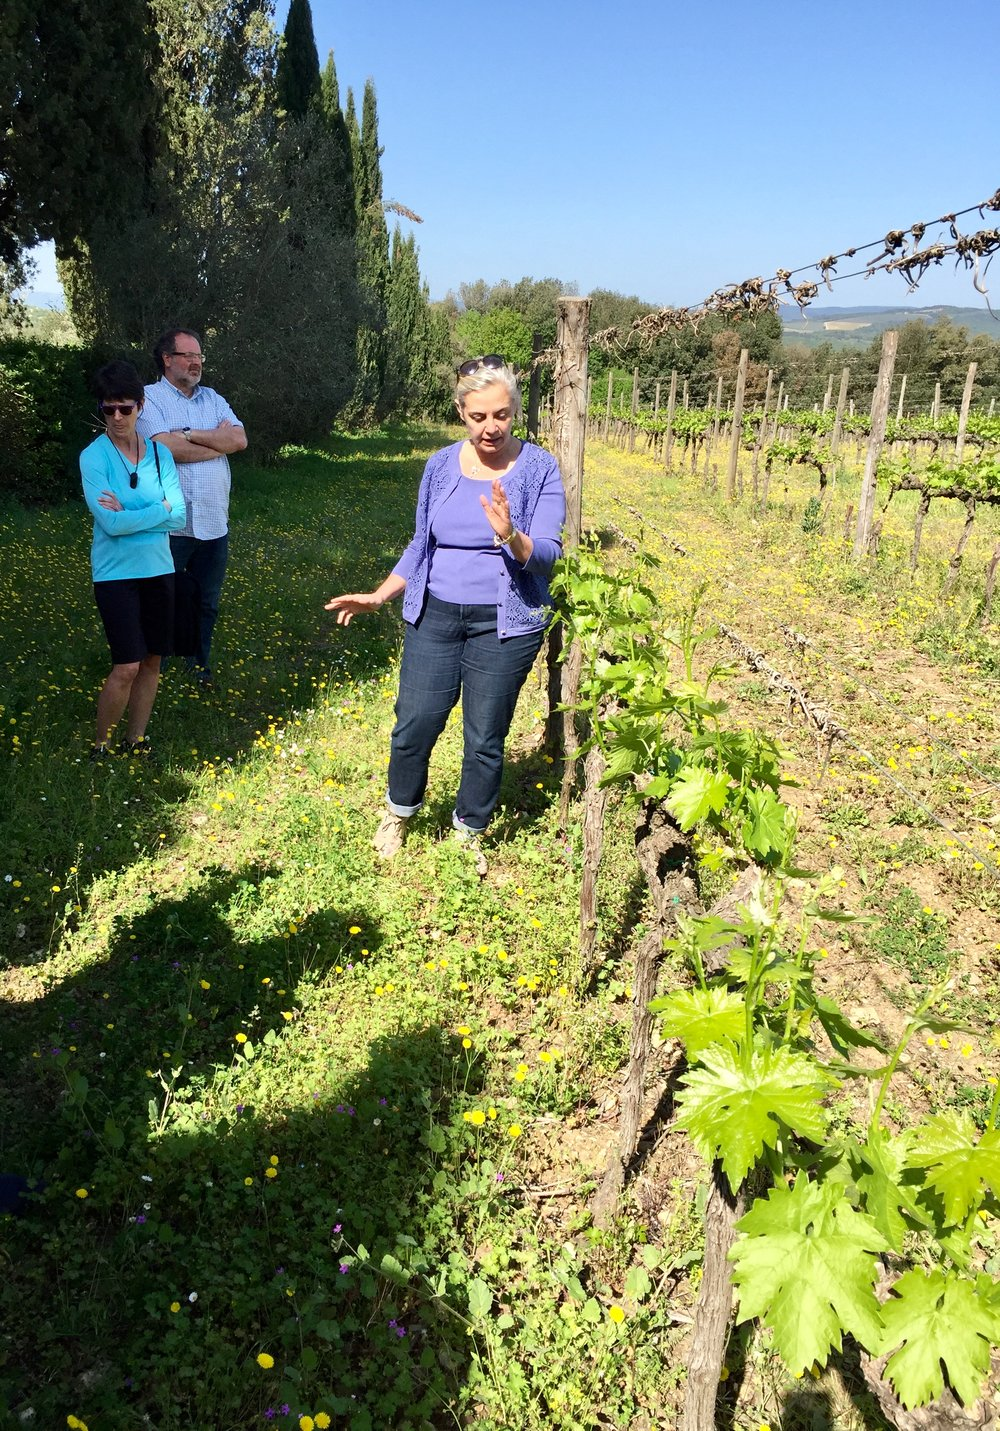 Copy of  Emilia Silvio Nardi explaining pruning techniques in the vineyards of Silvio Nardi in Montalcino.